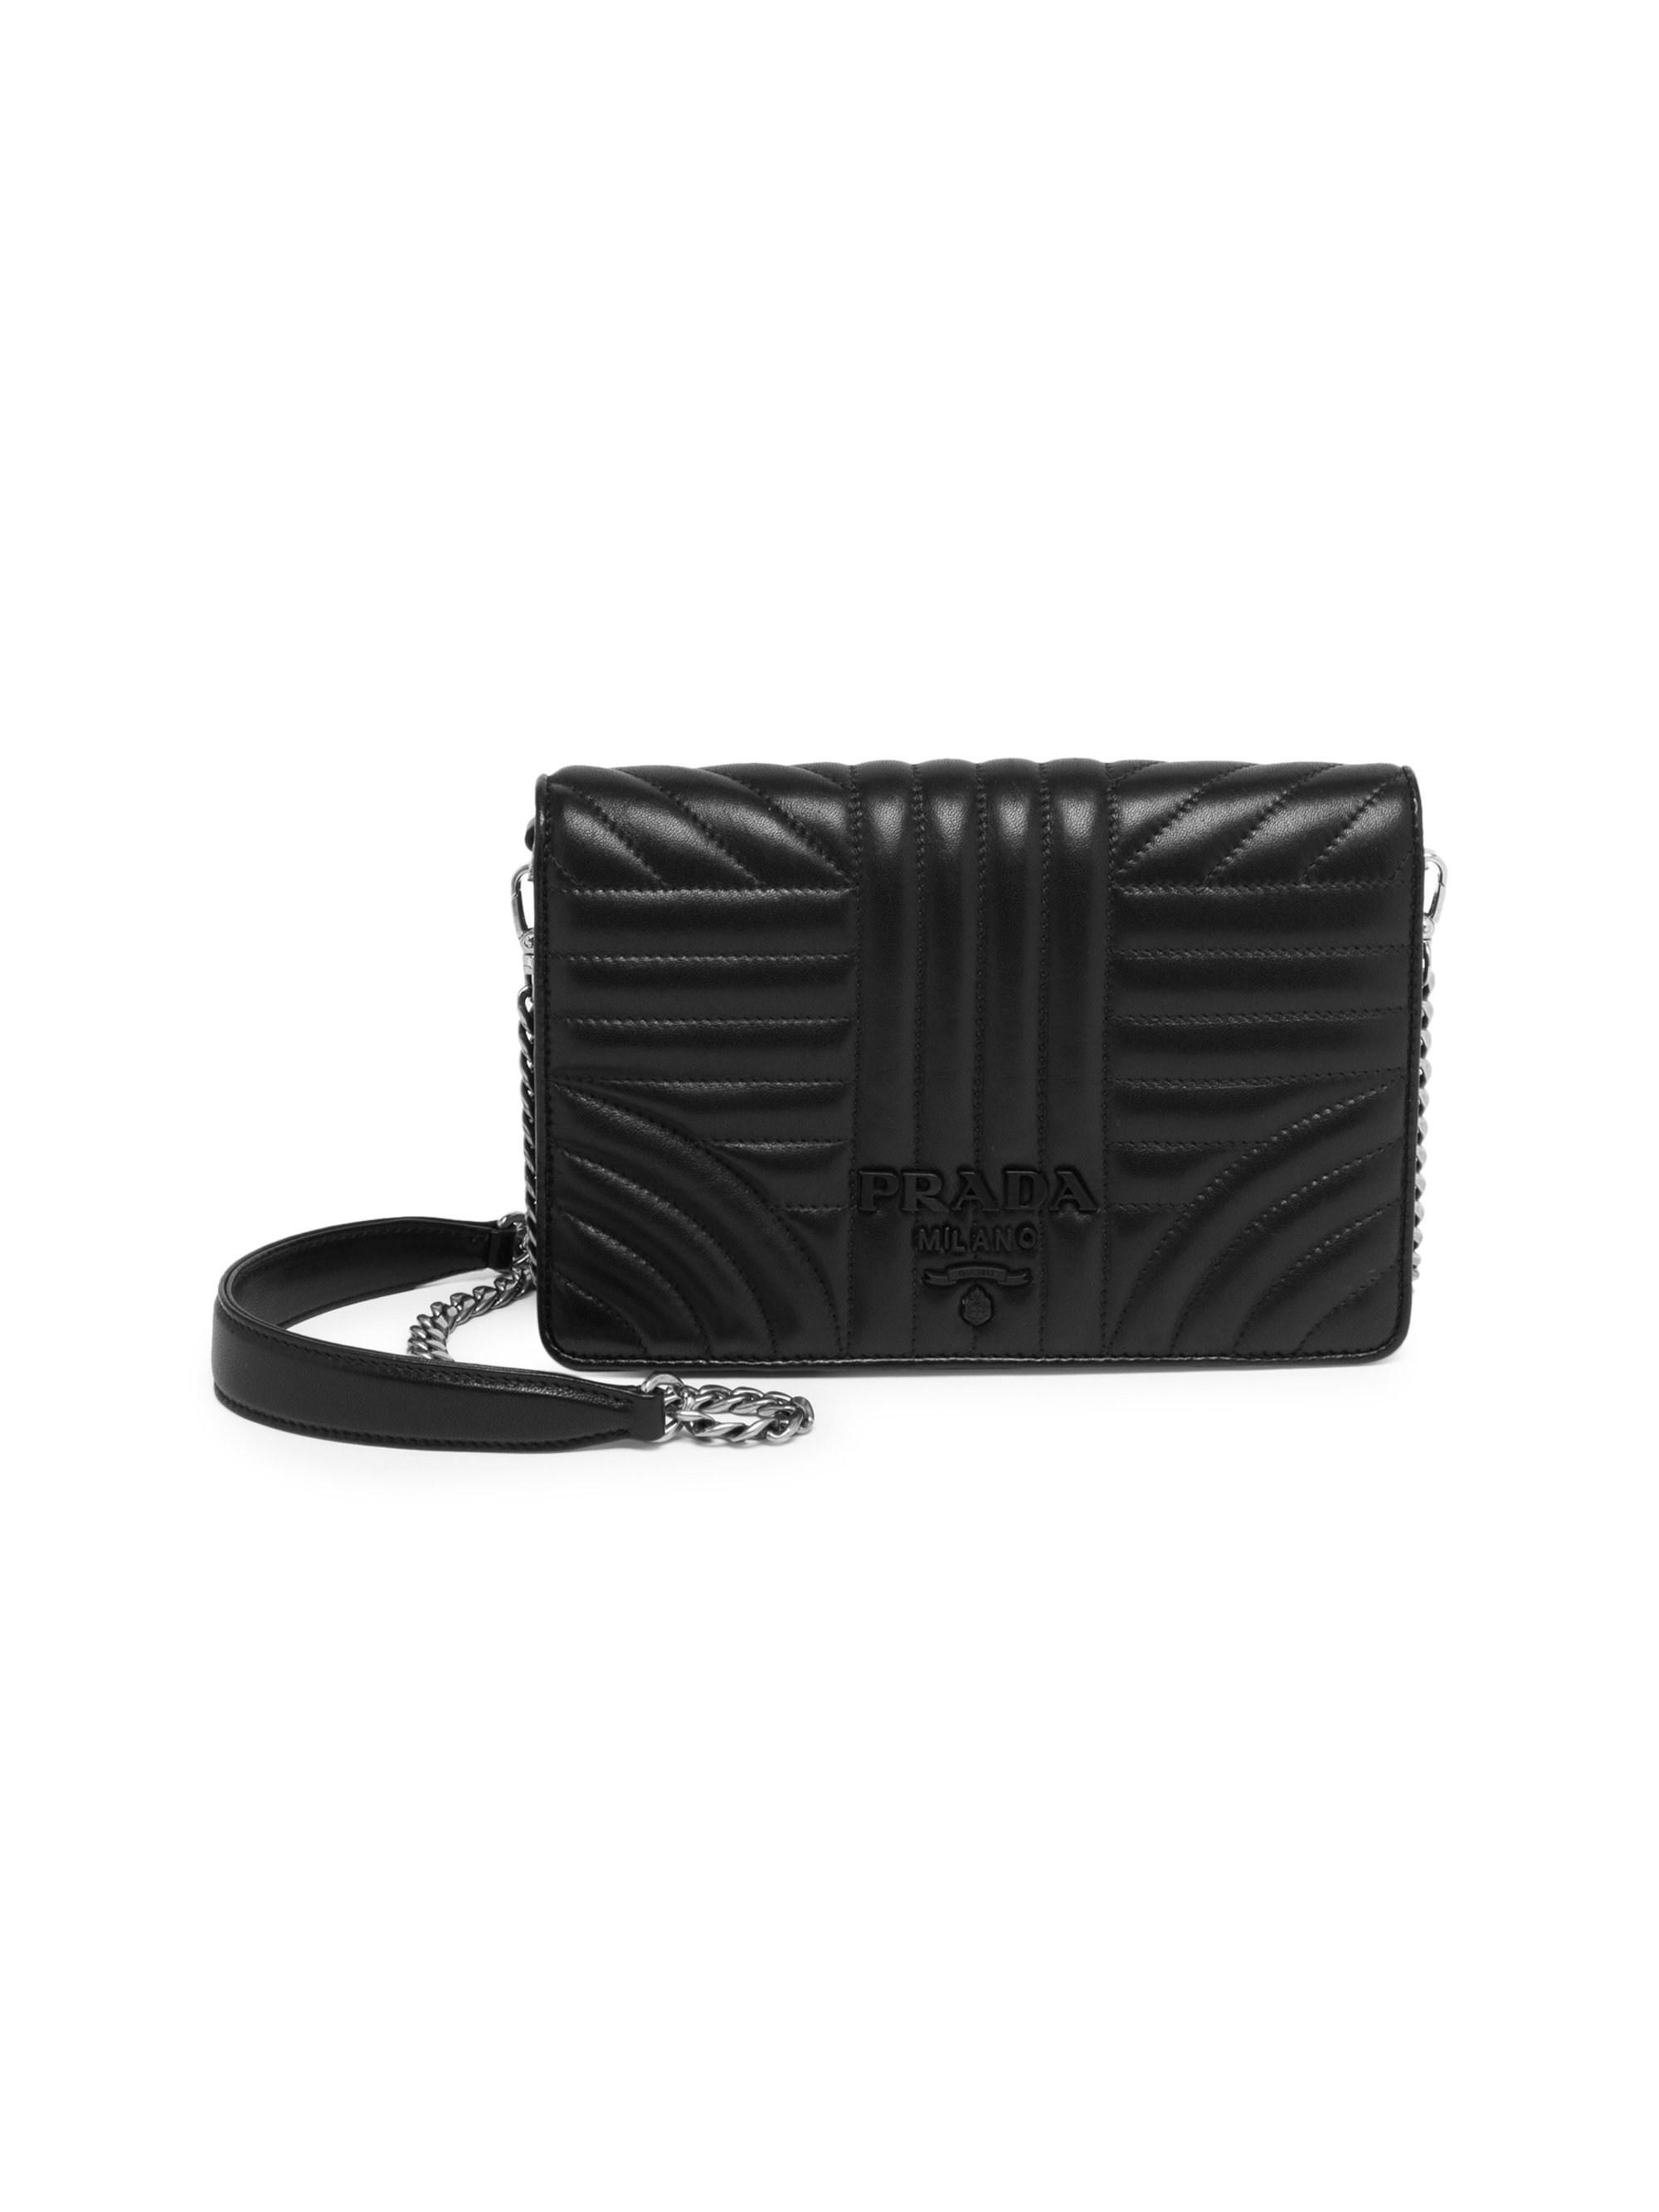 08bcc528f5ad Prada Women's Diagramme Nappa Impunture Shoulder Bag - Black in ...